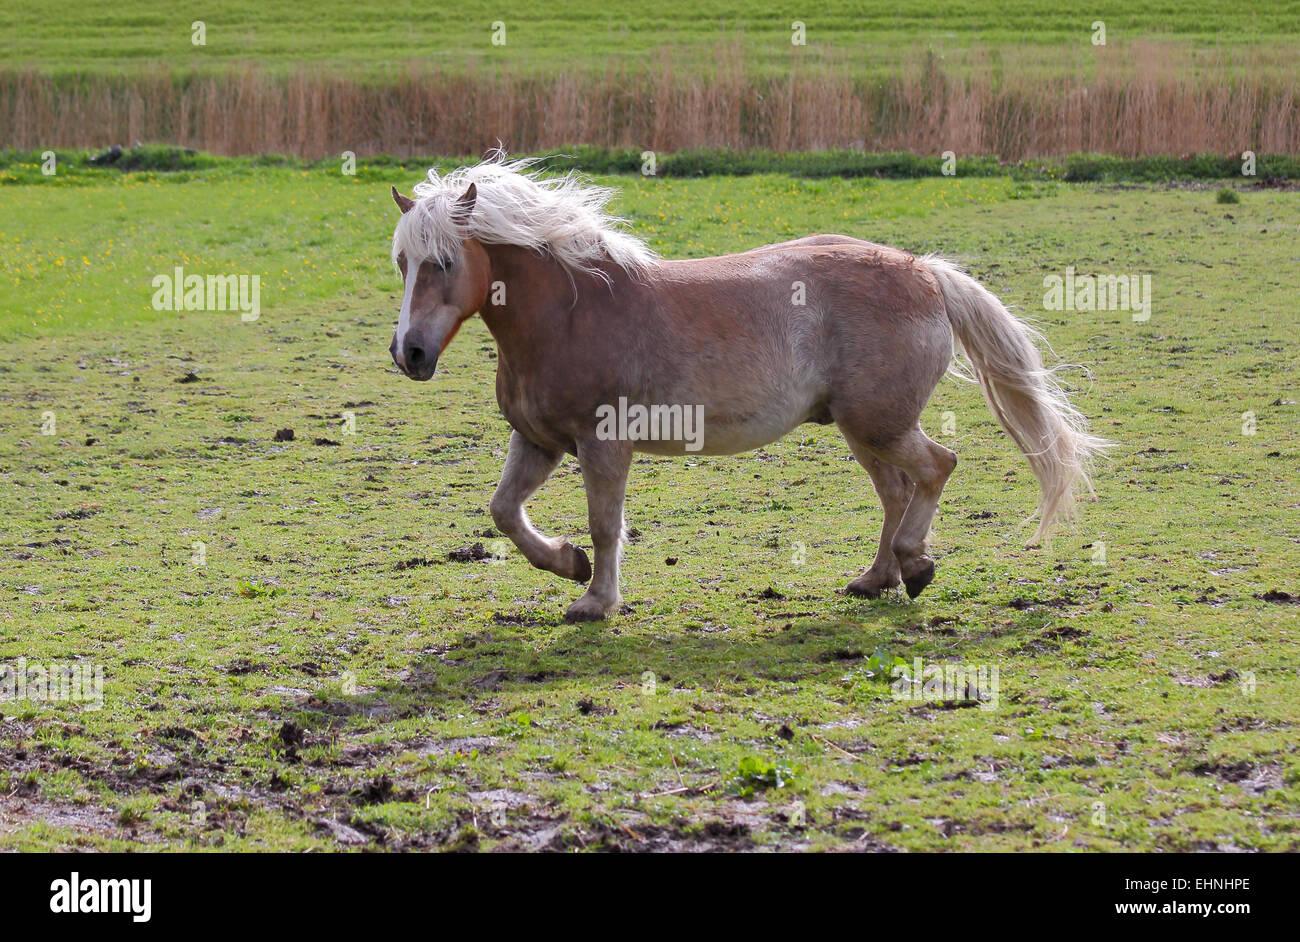 Haflinger gelding - Stock Image